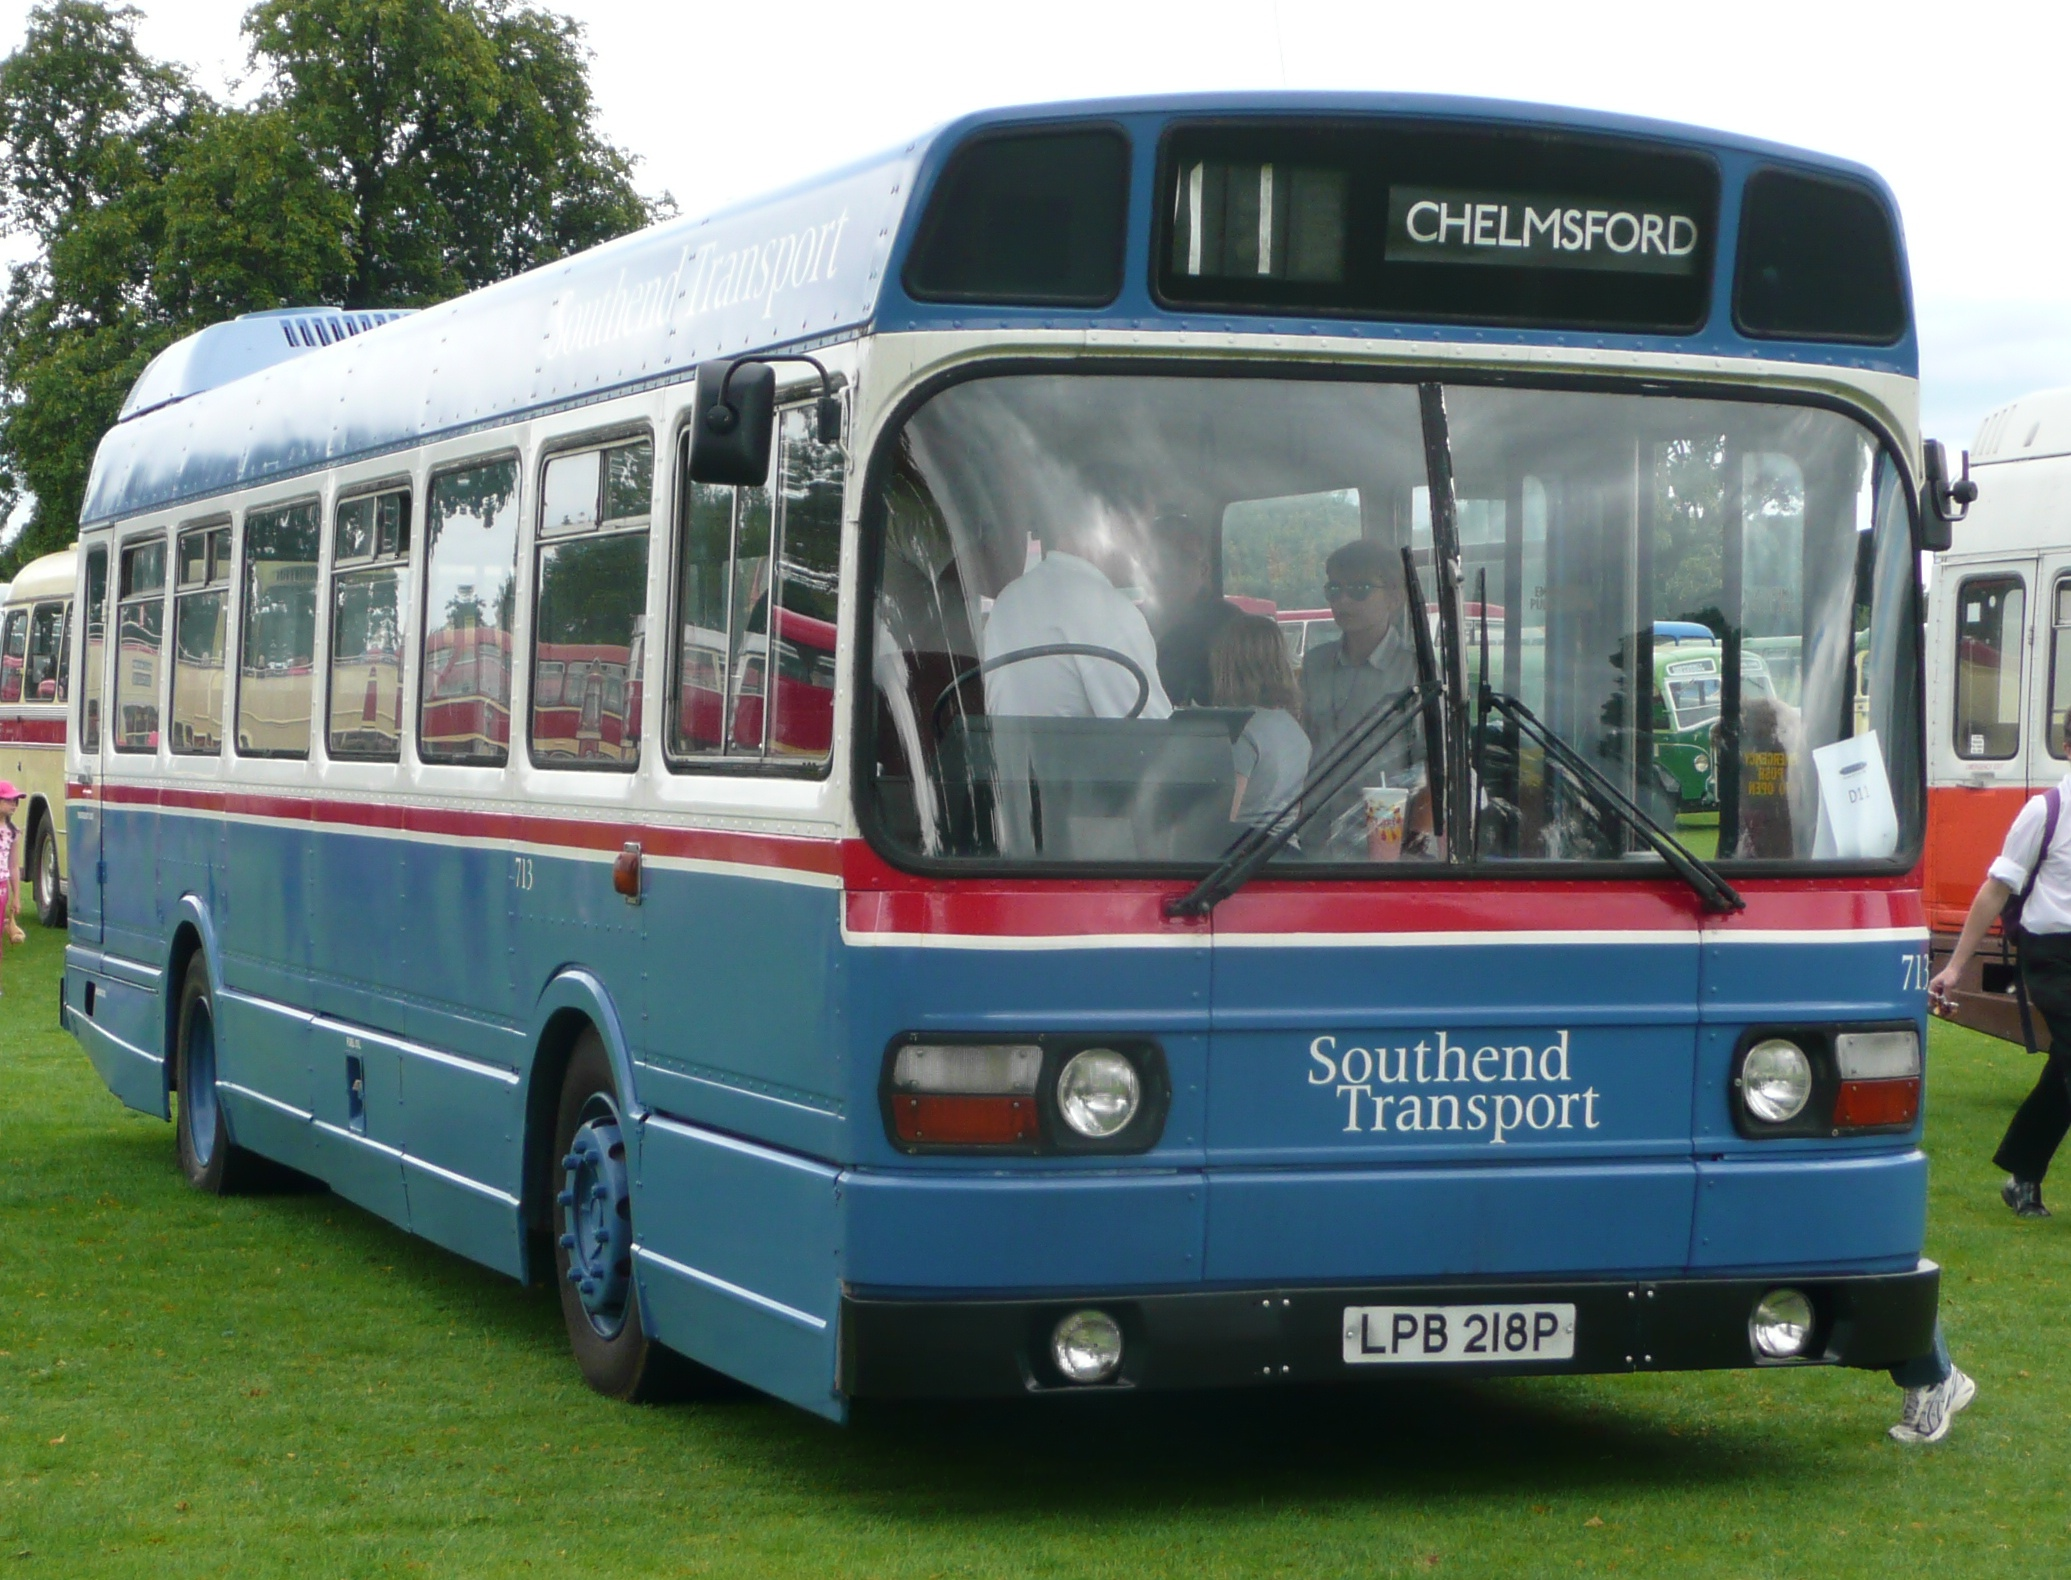 File:Southend Transport 713.JPG - Wikipedia, the free encyclopedia